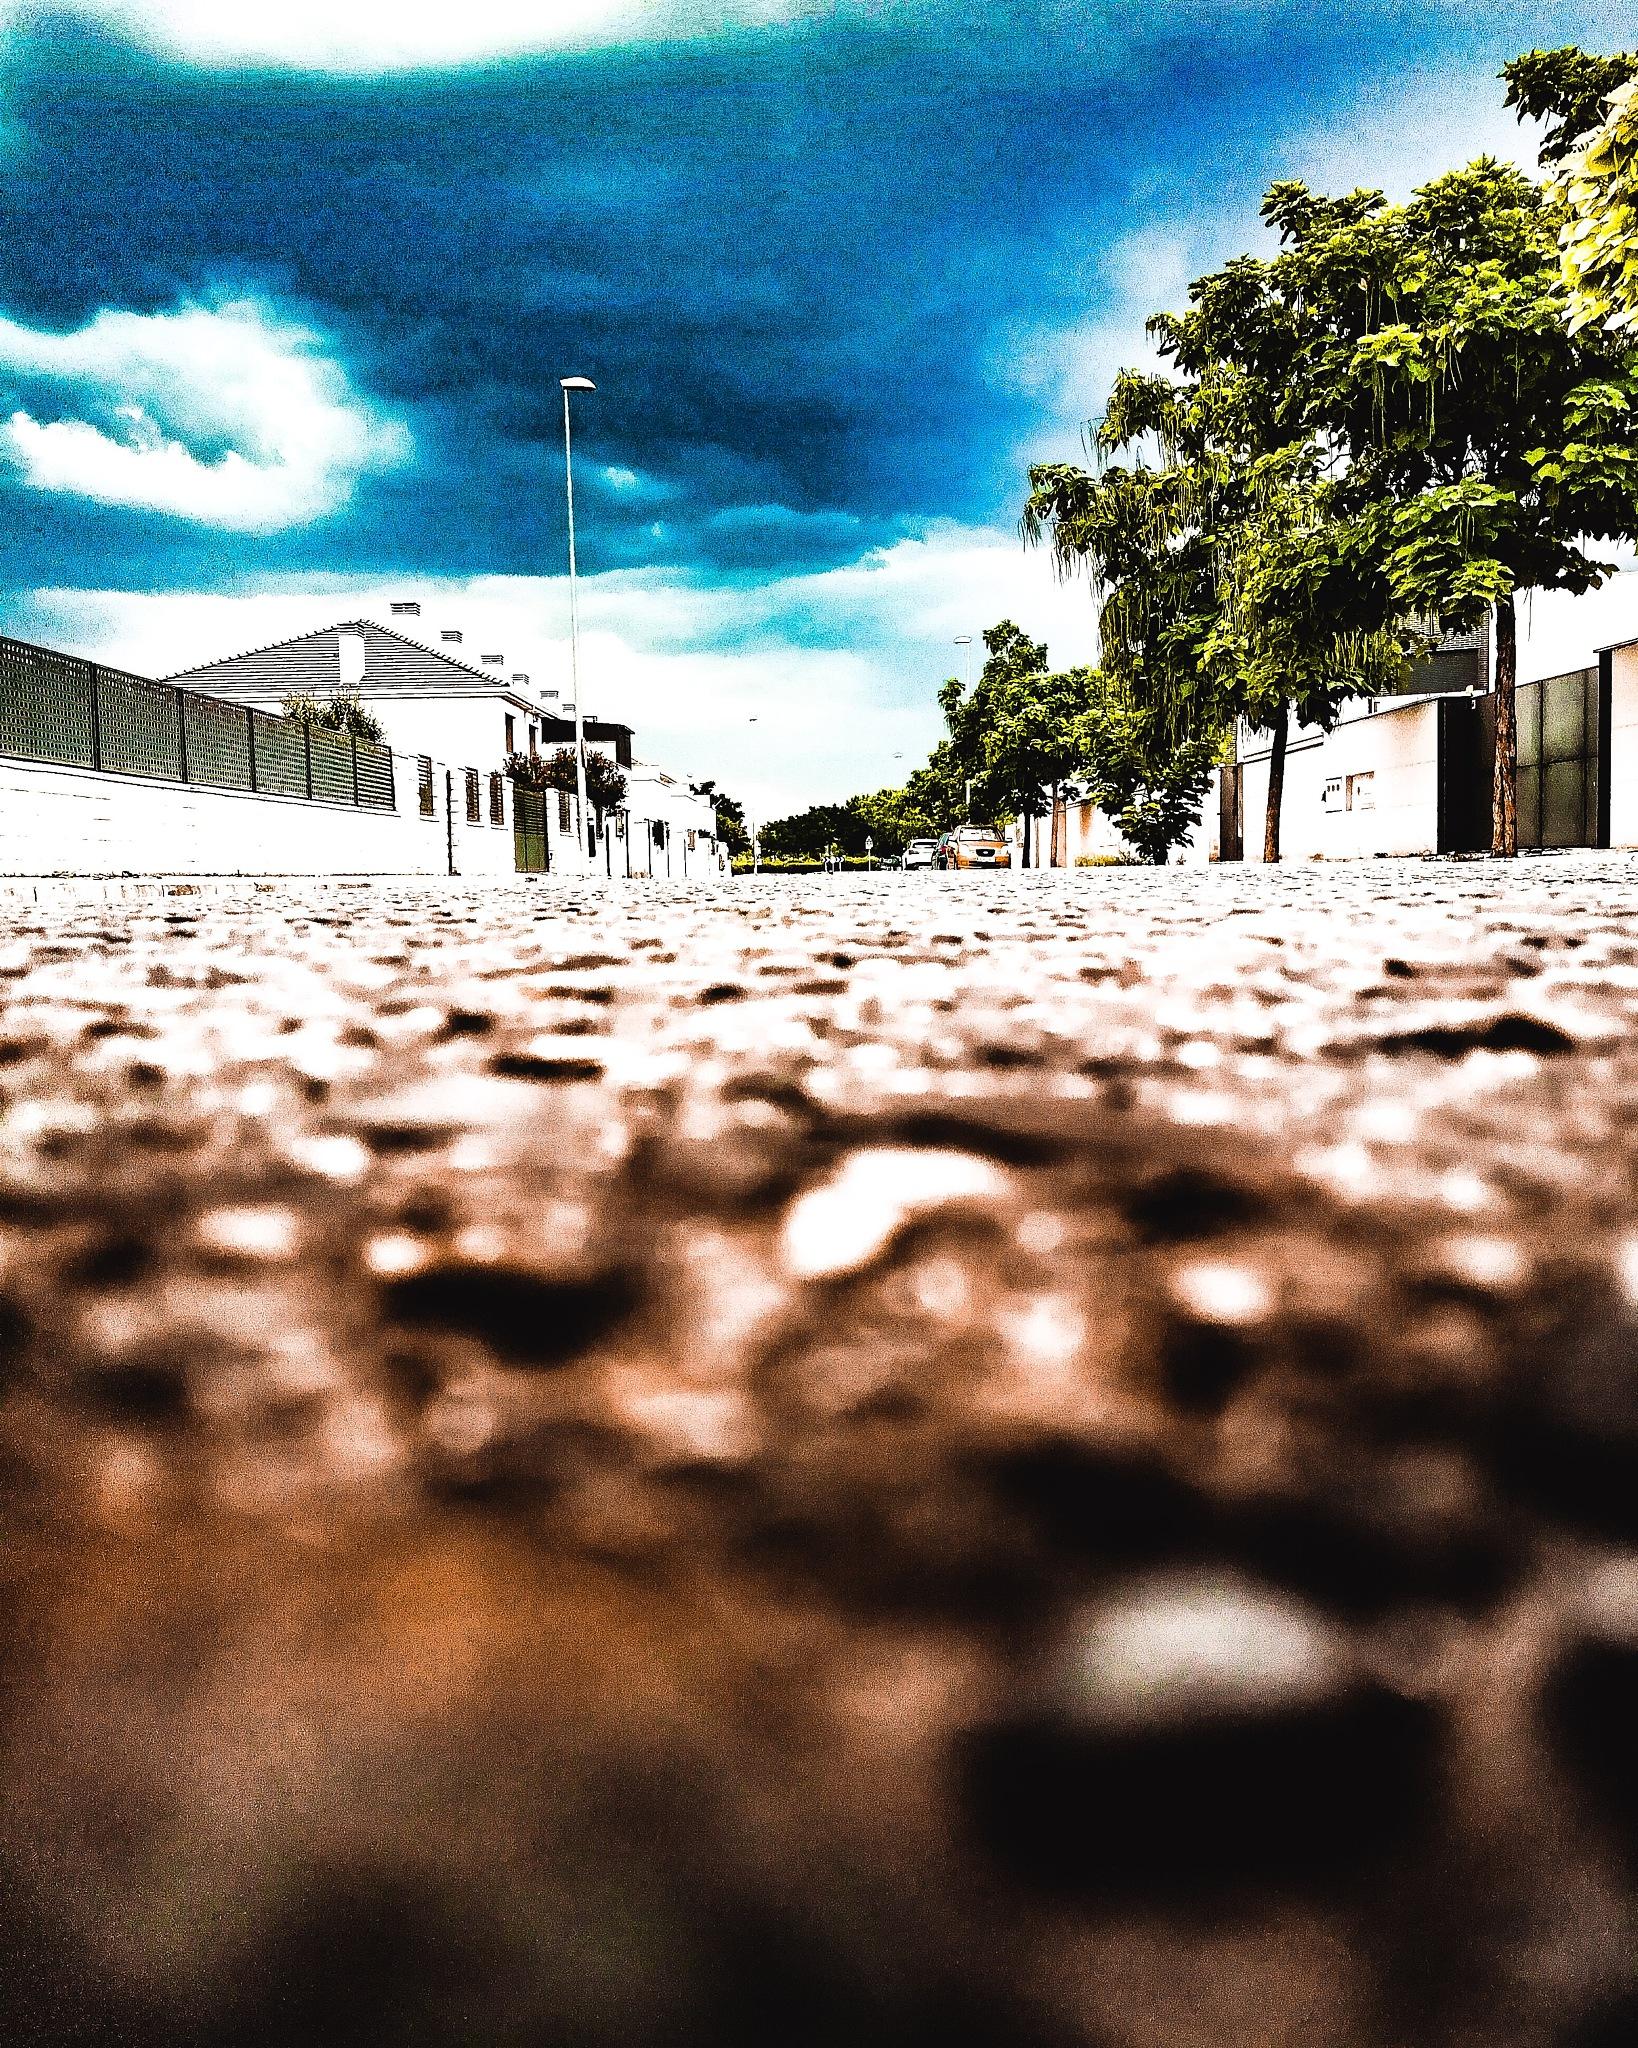 street  by Sr_Catch_19